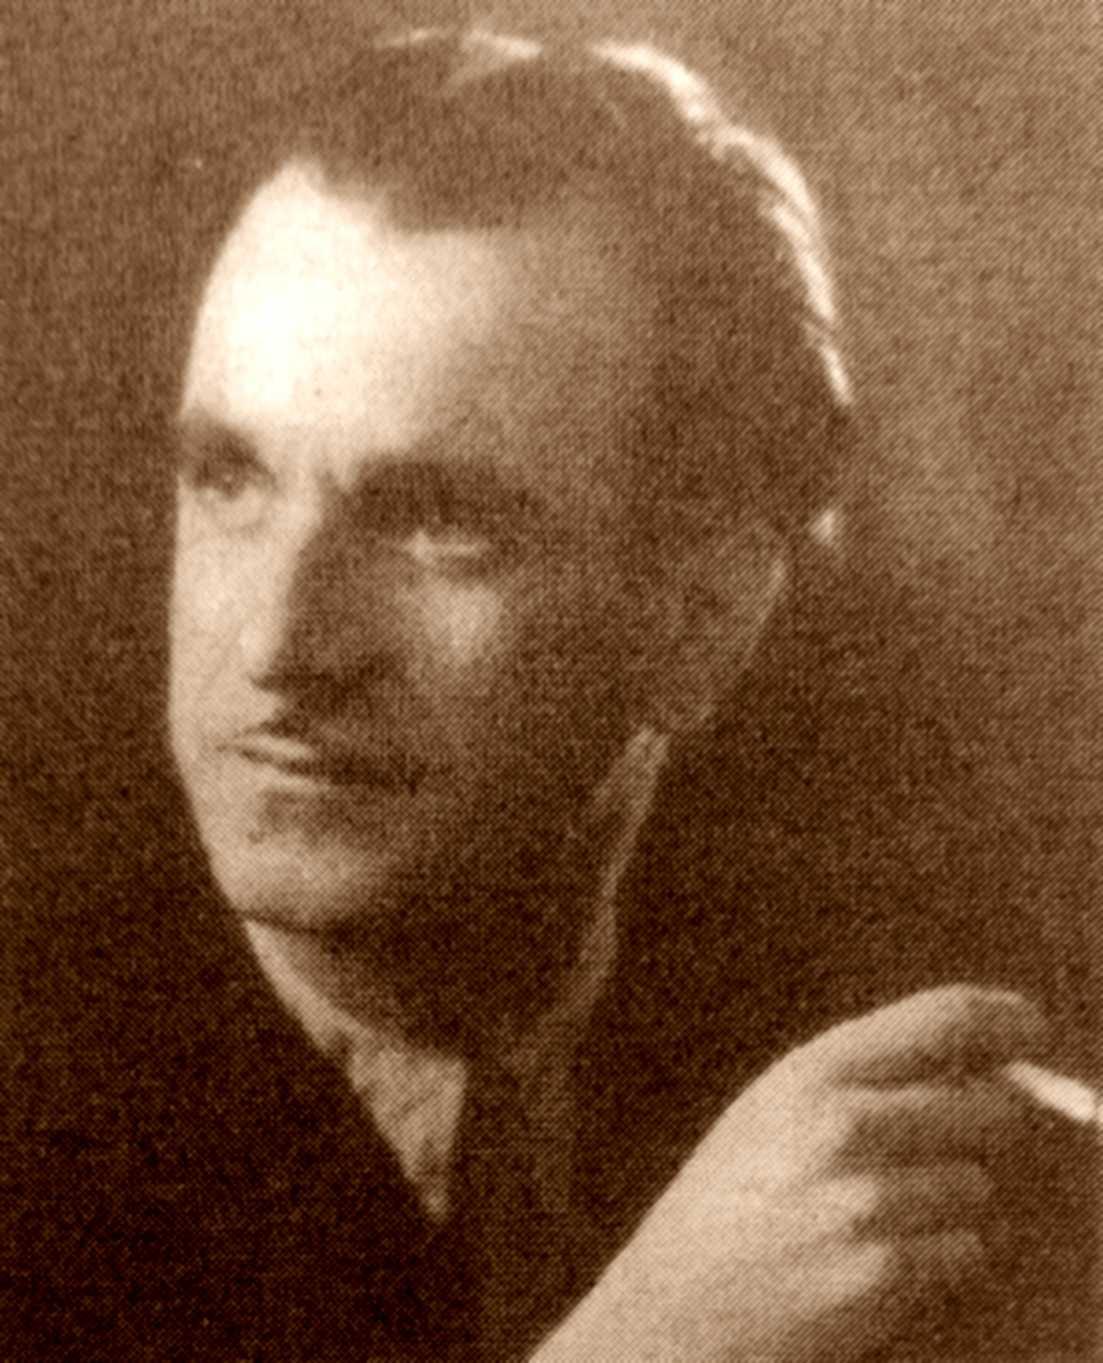 Luis Salmerón Avilés